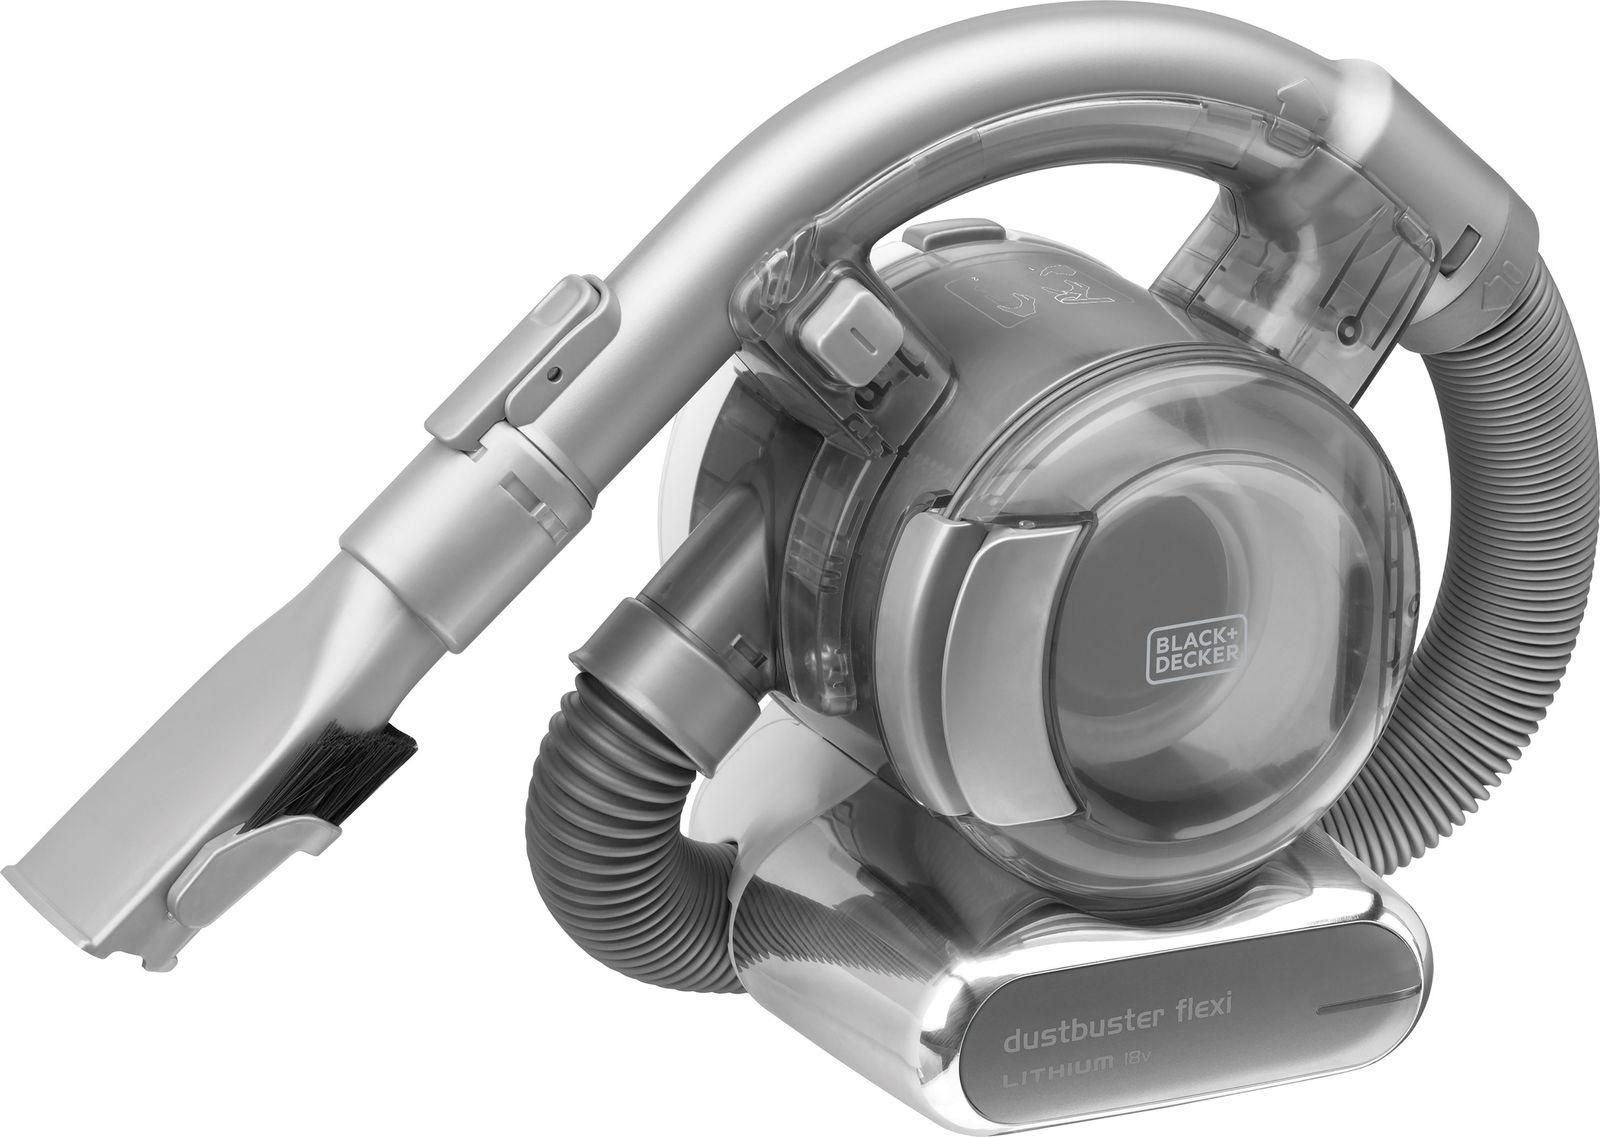 Пылесос Black+Decker Dustbuster Flexi, серый